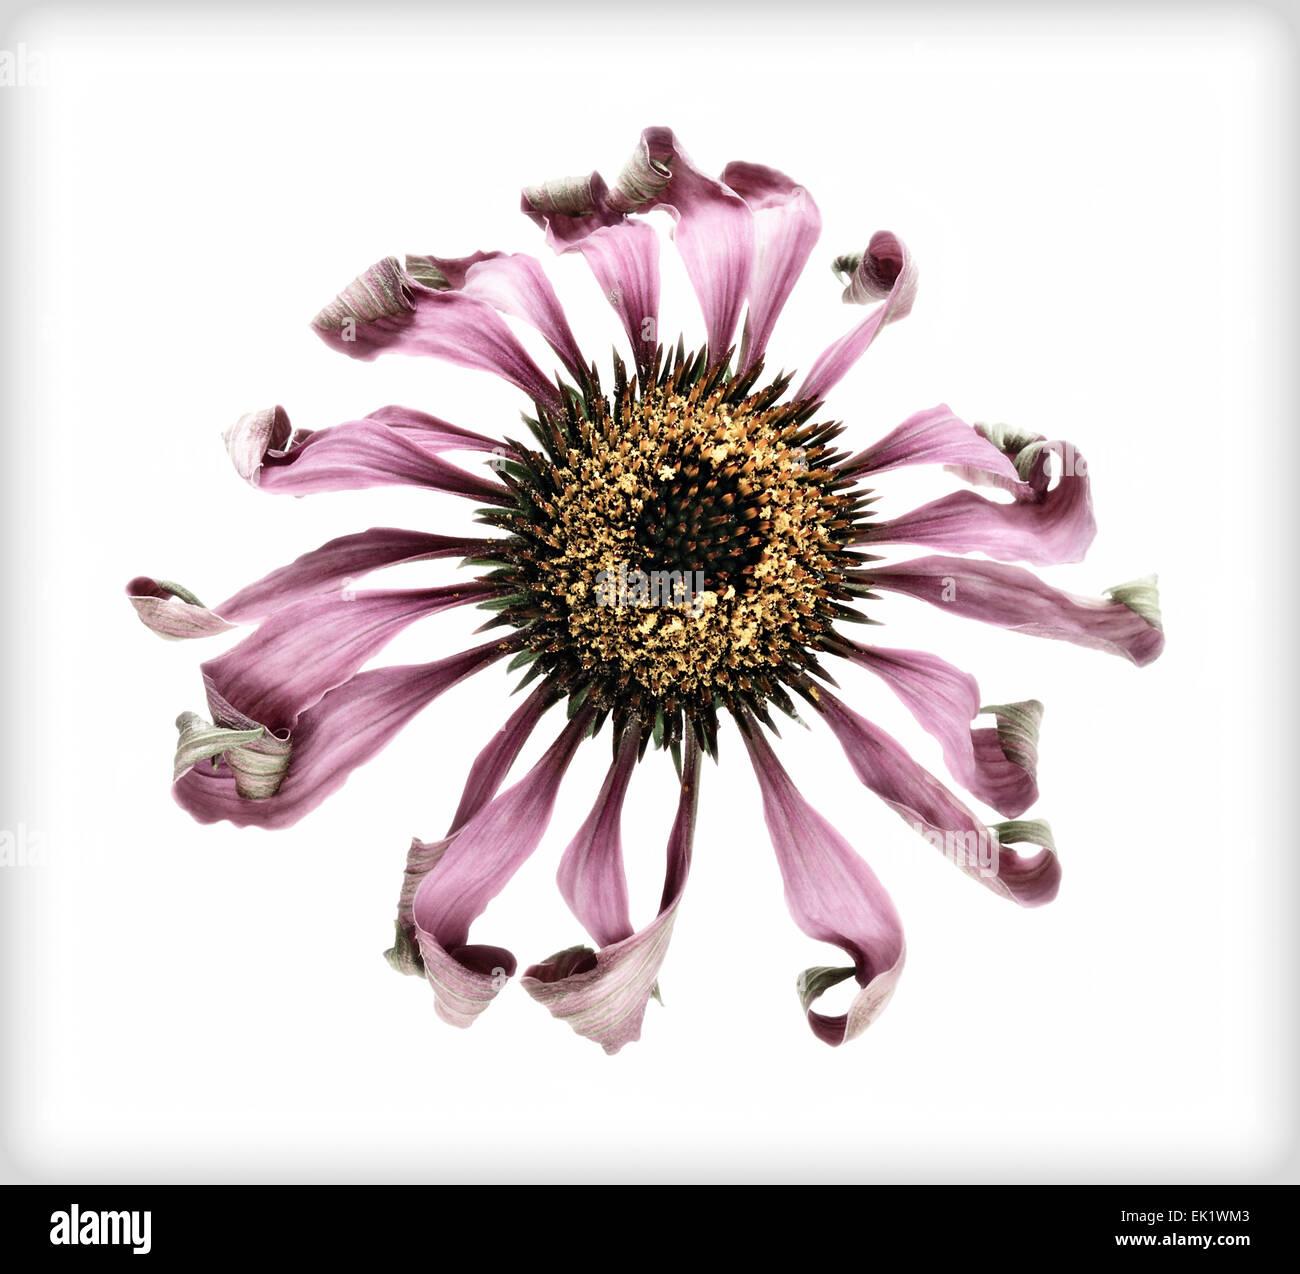 "Welk ""Echinacea Purpurea"" Echinacea, Serie DB-3 von 3 Stockbild"